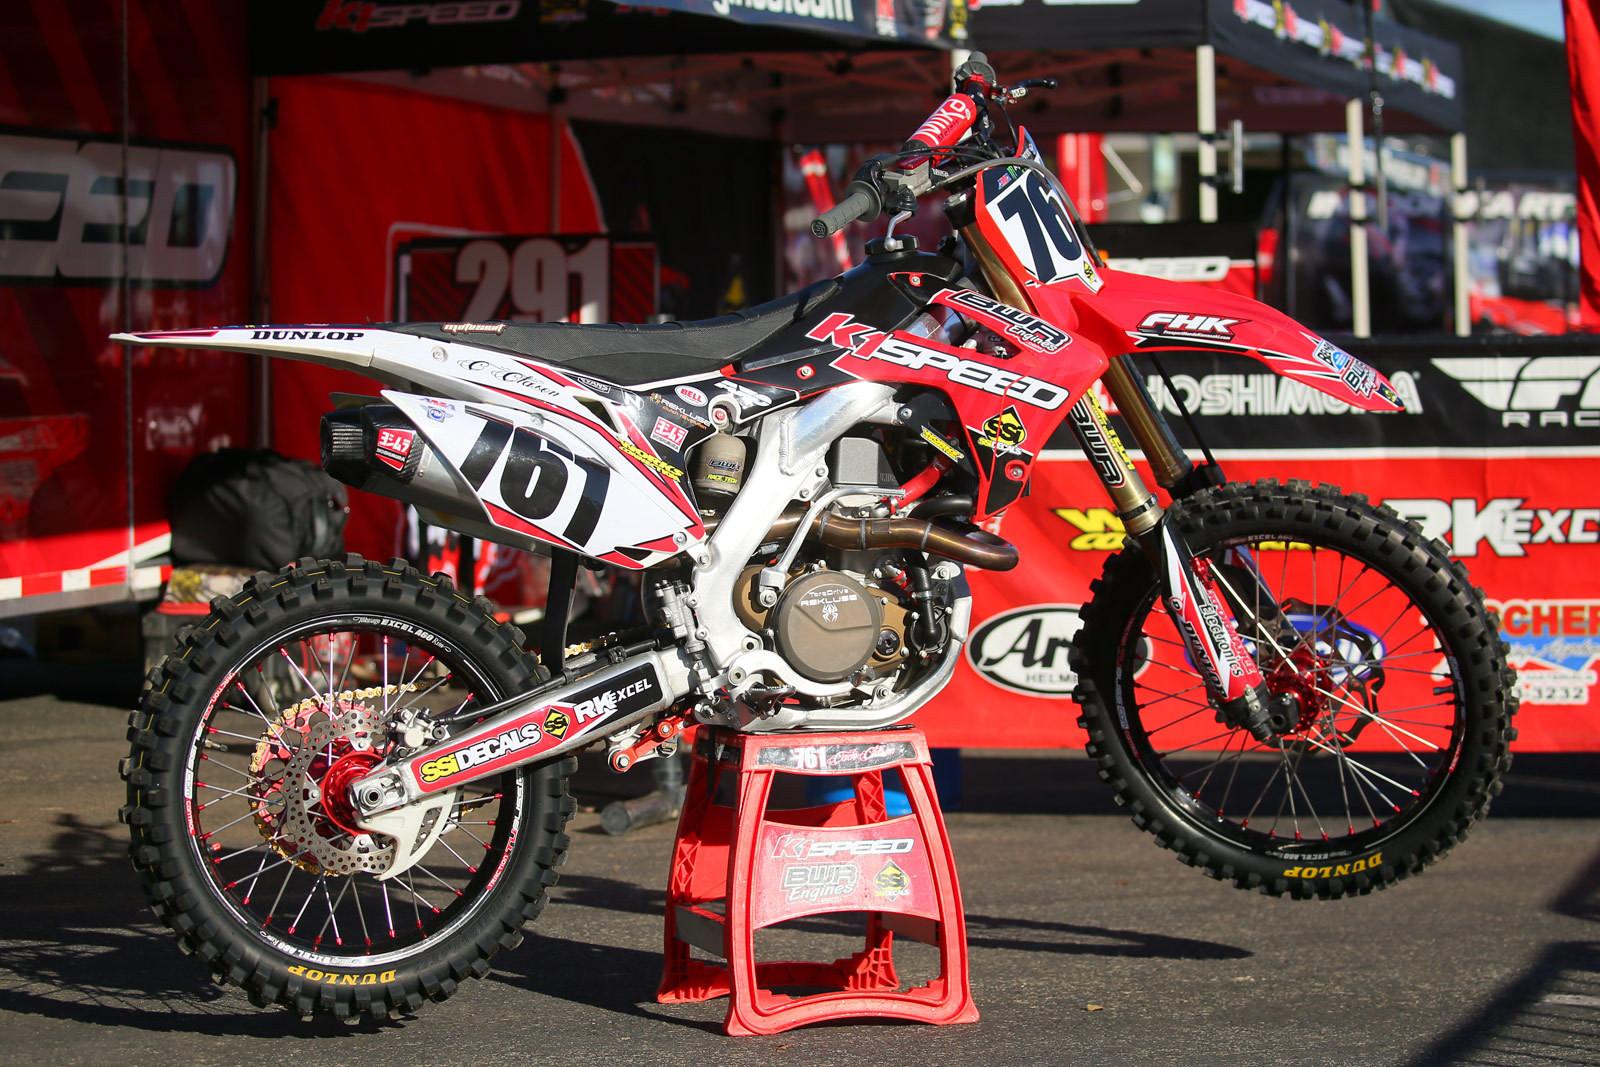 Cade Clason - 2016 Bikes of Supercross - Motocross Pictures - Vital MX